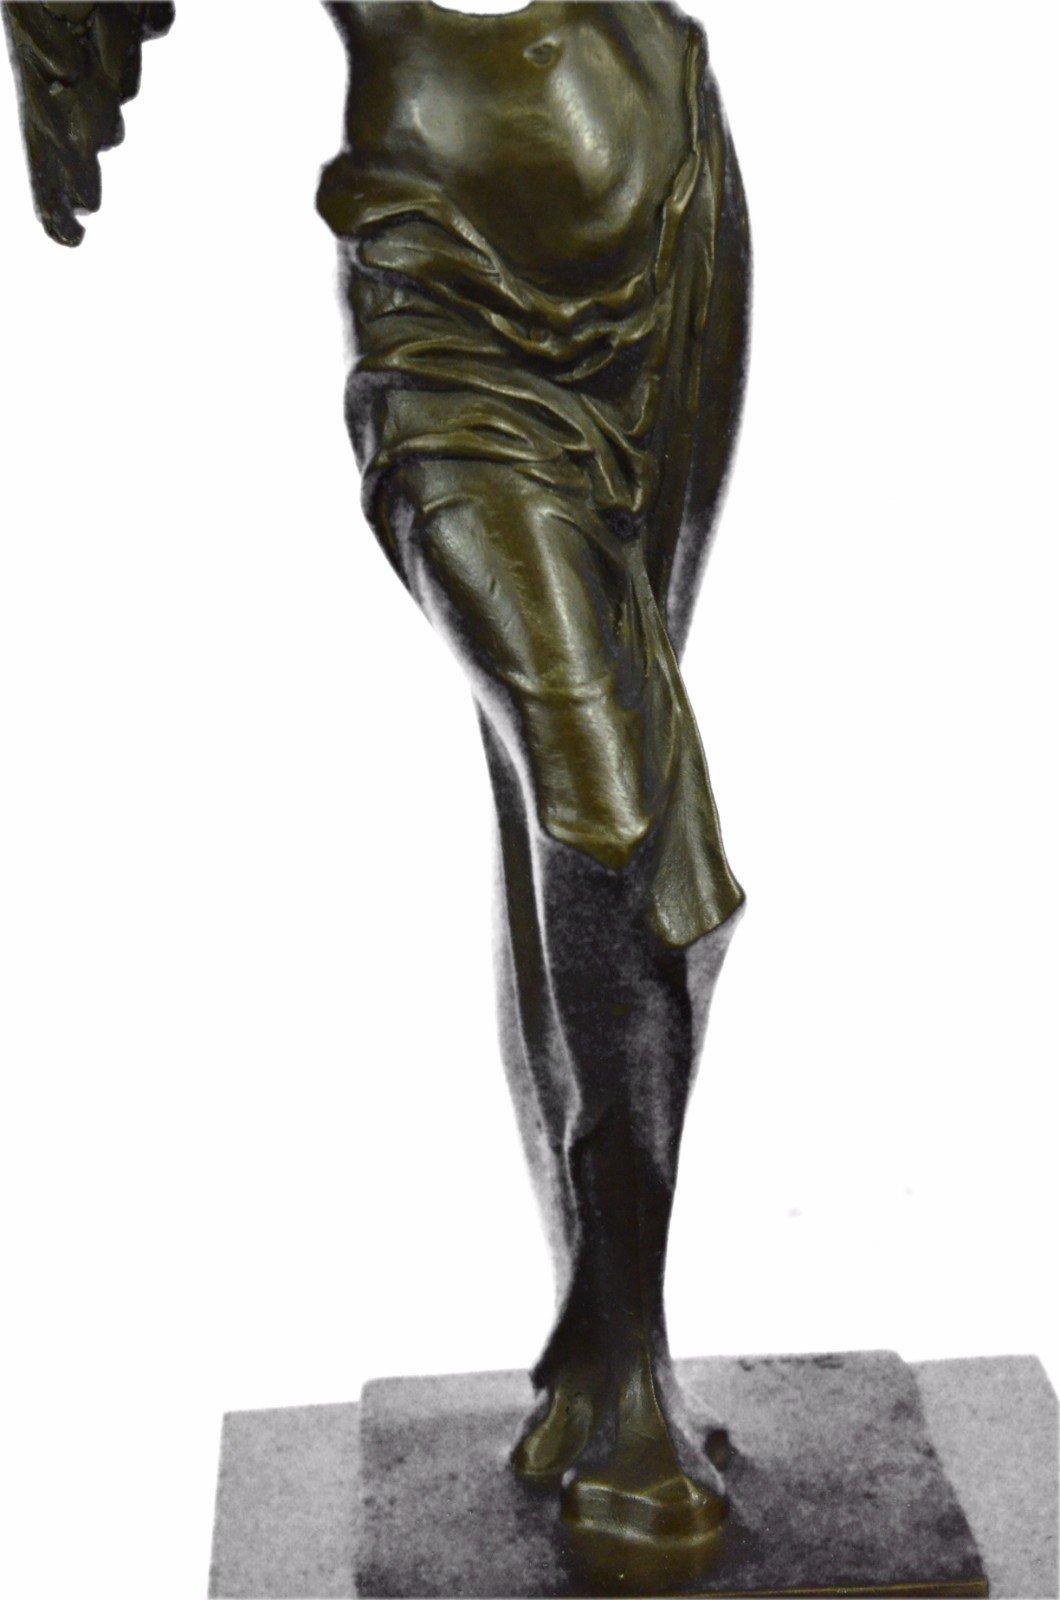 Handmade European Bronze Sculpture Salvator Dali Surrealistic Angel Abstract Modern Art Art Bronze Statue -UKXN-2546-Decor Collectible Gift by Bronzioni (Image #9)